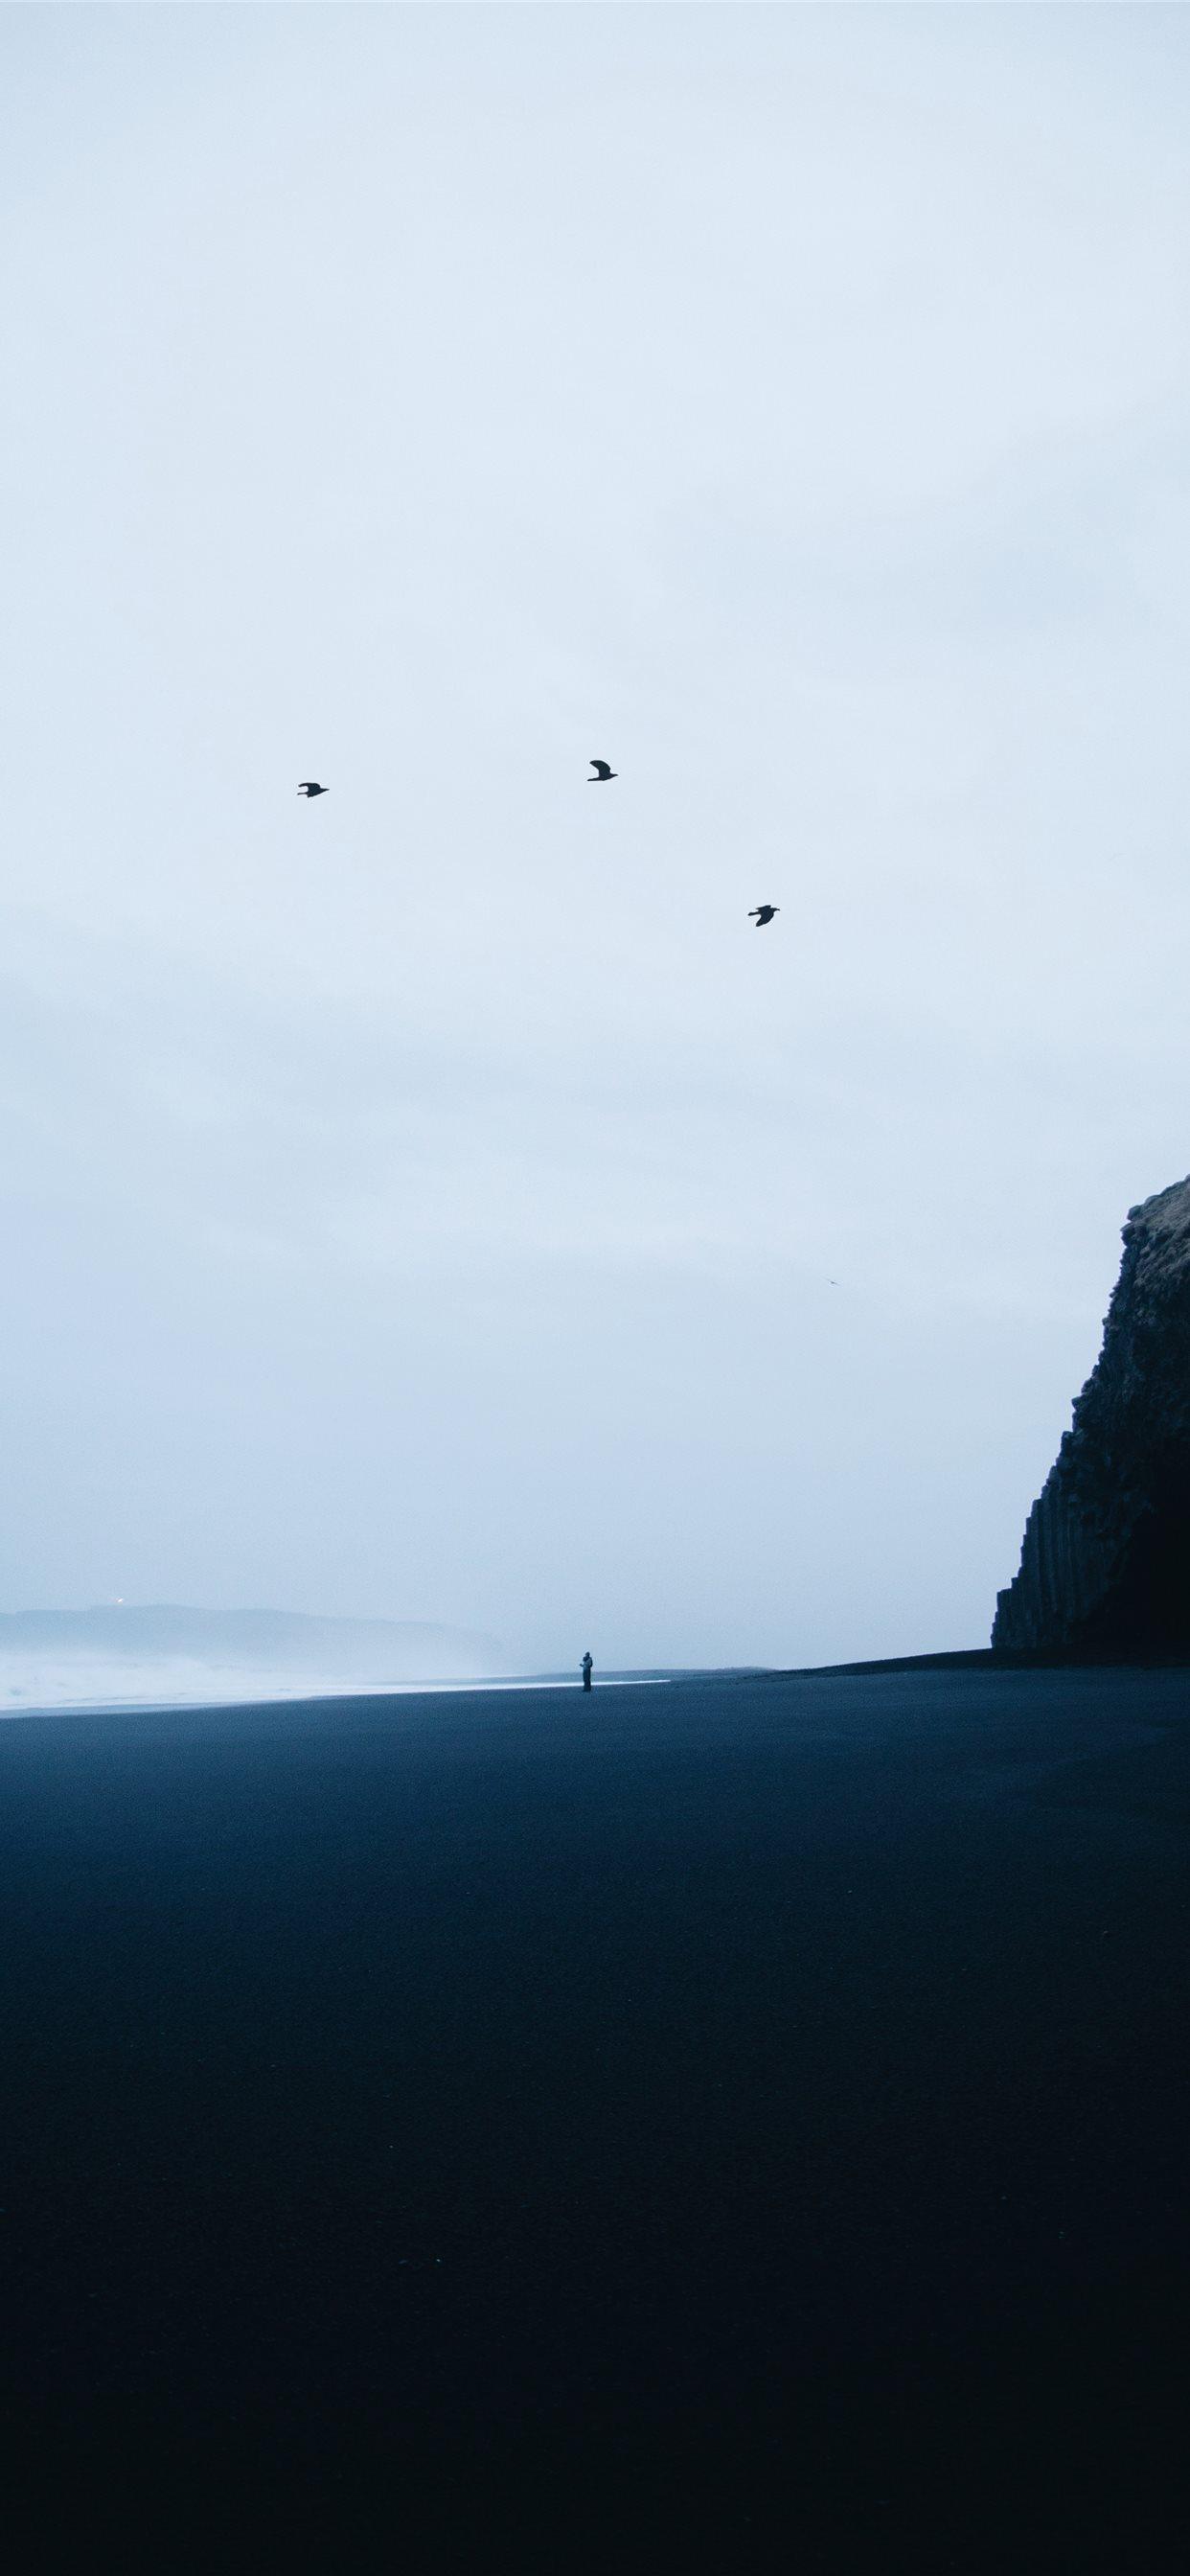 reynisfjara black sand beach iphone